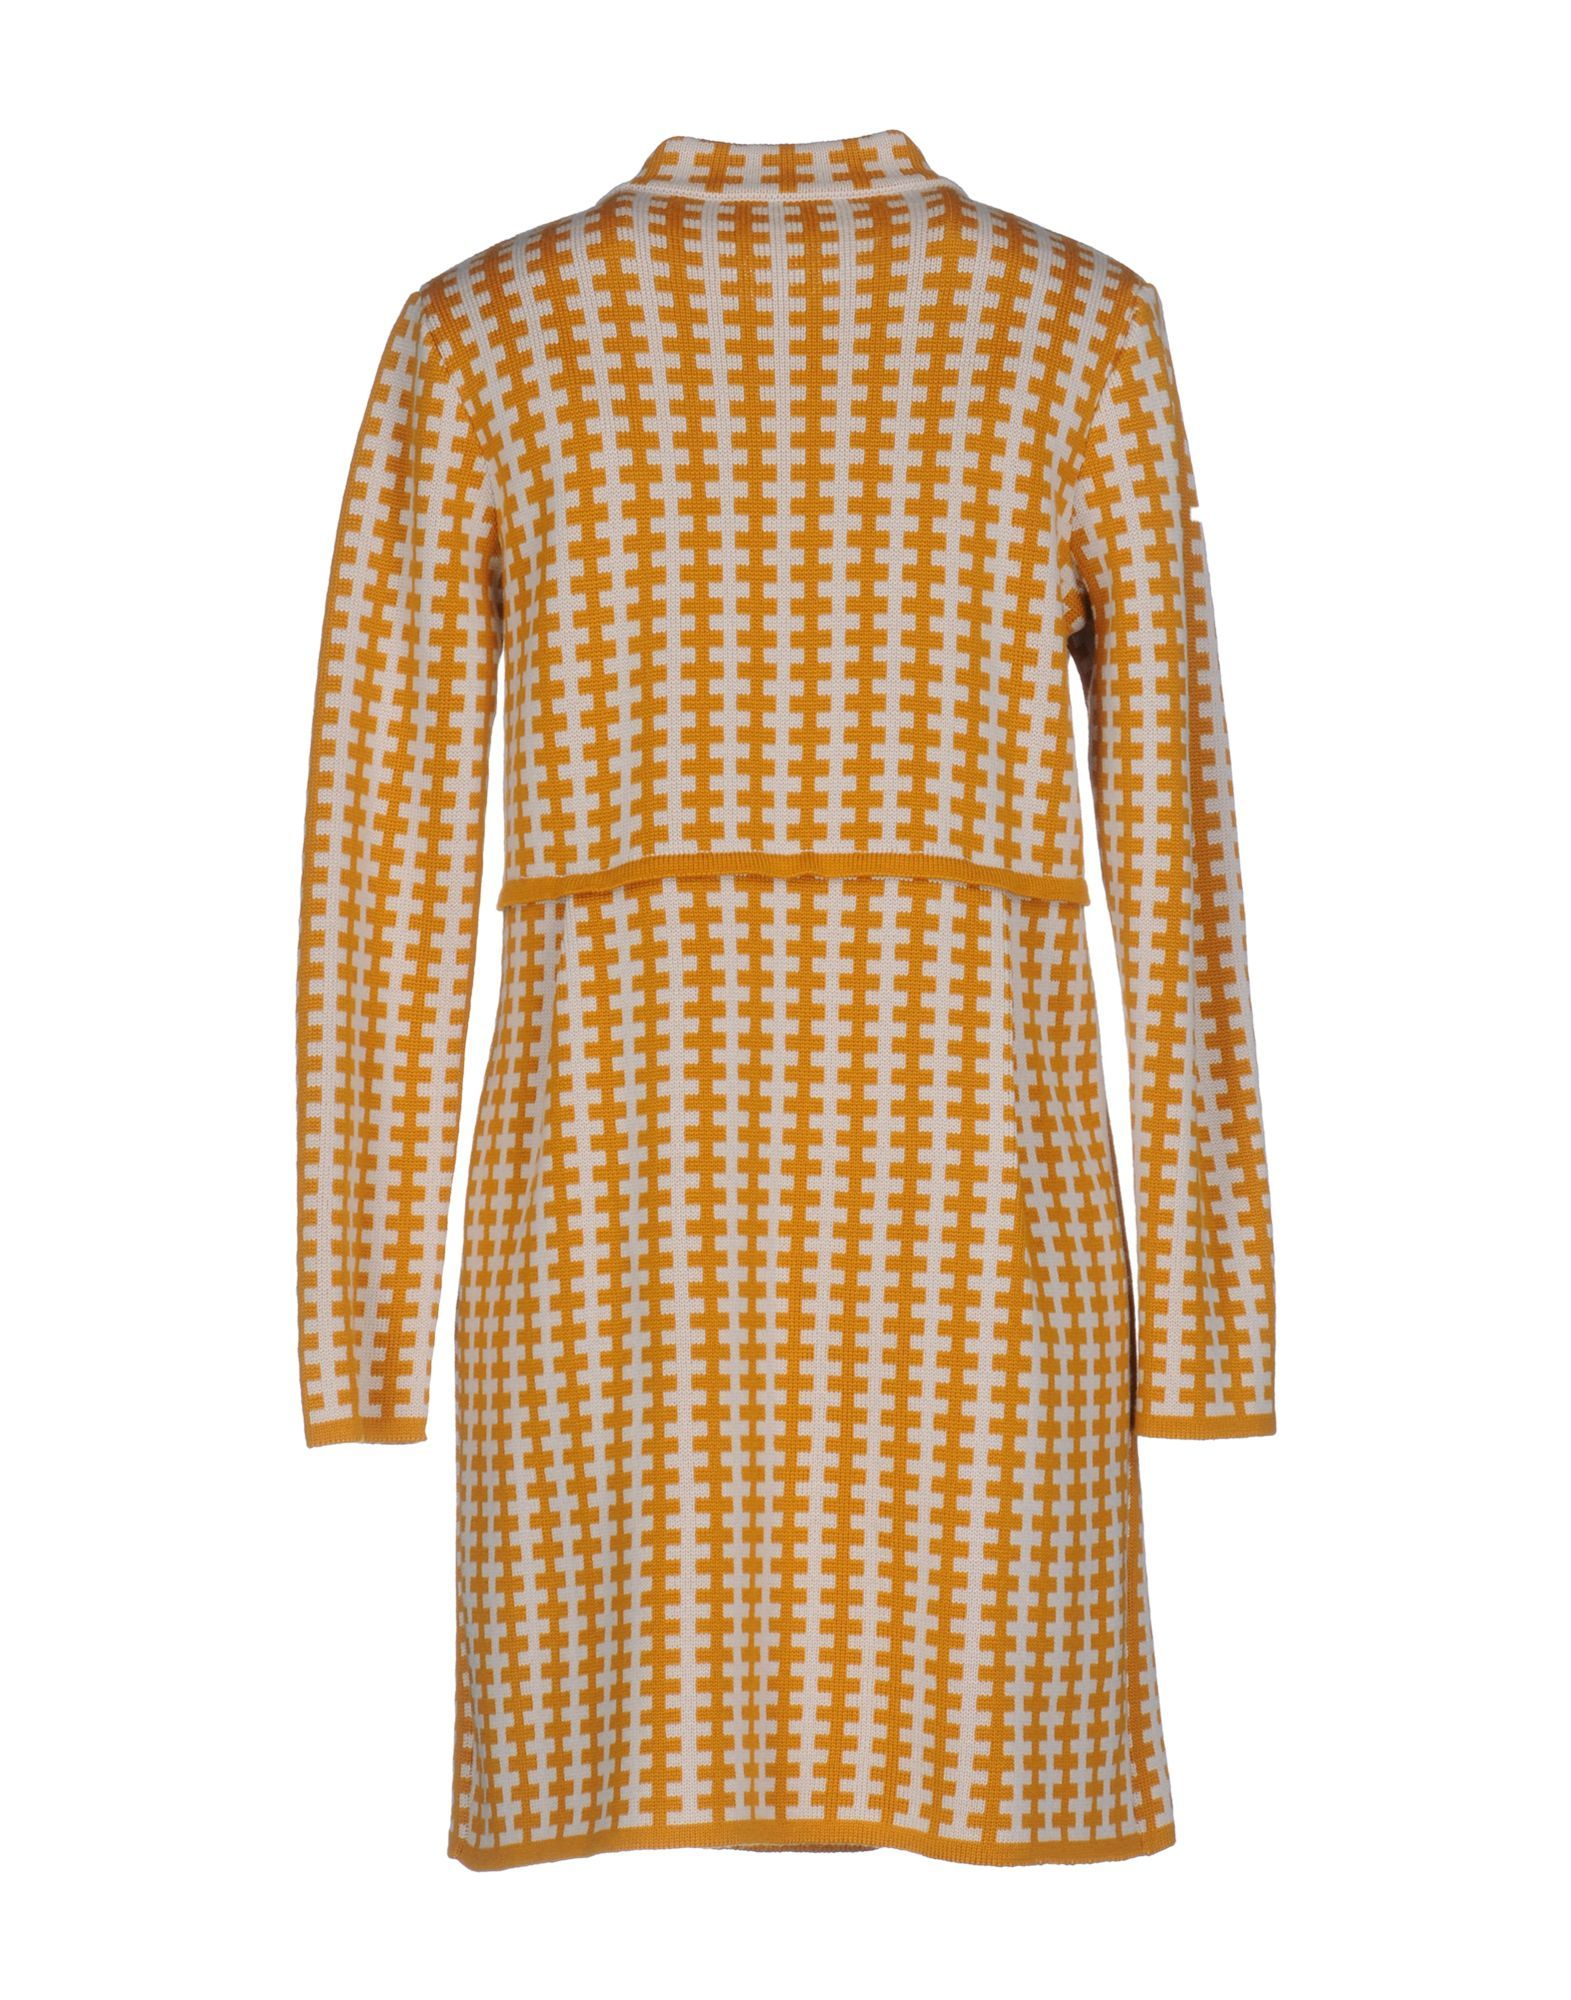 El La� Lago Di Como Ochre Merino Wool Double Breasted Coat